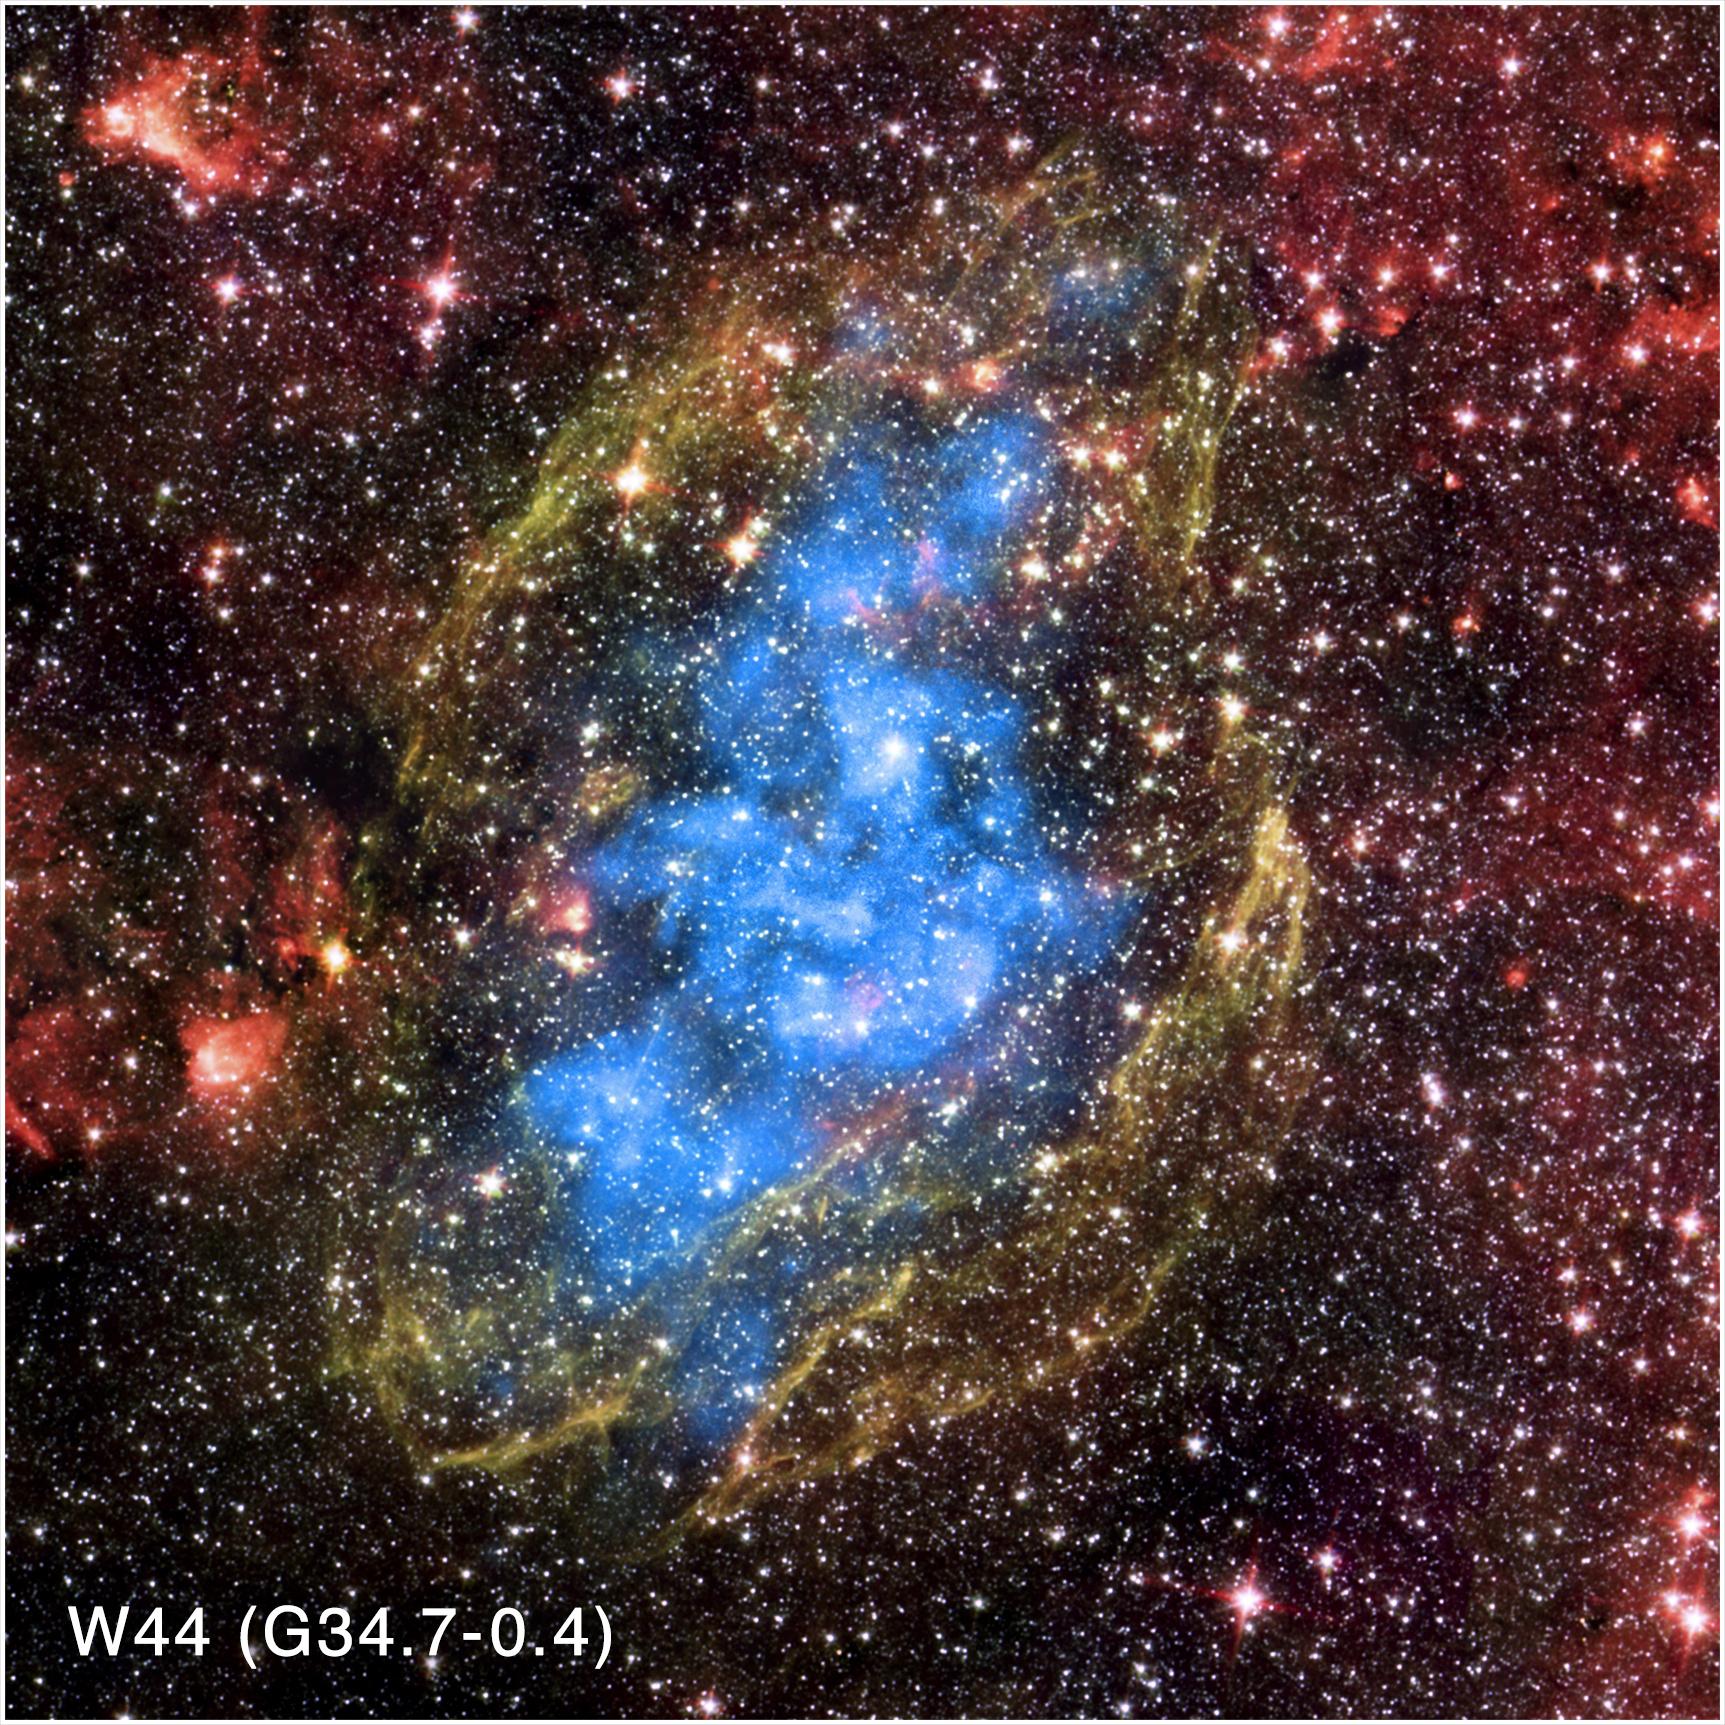 Image credit: Chandra X-ray Center / NASA'S Marshall Space Flight Center.